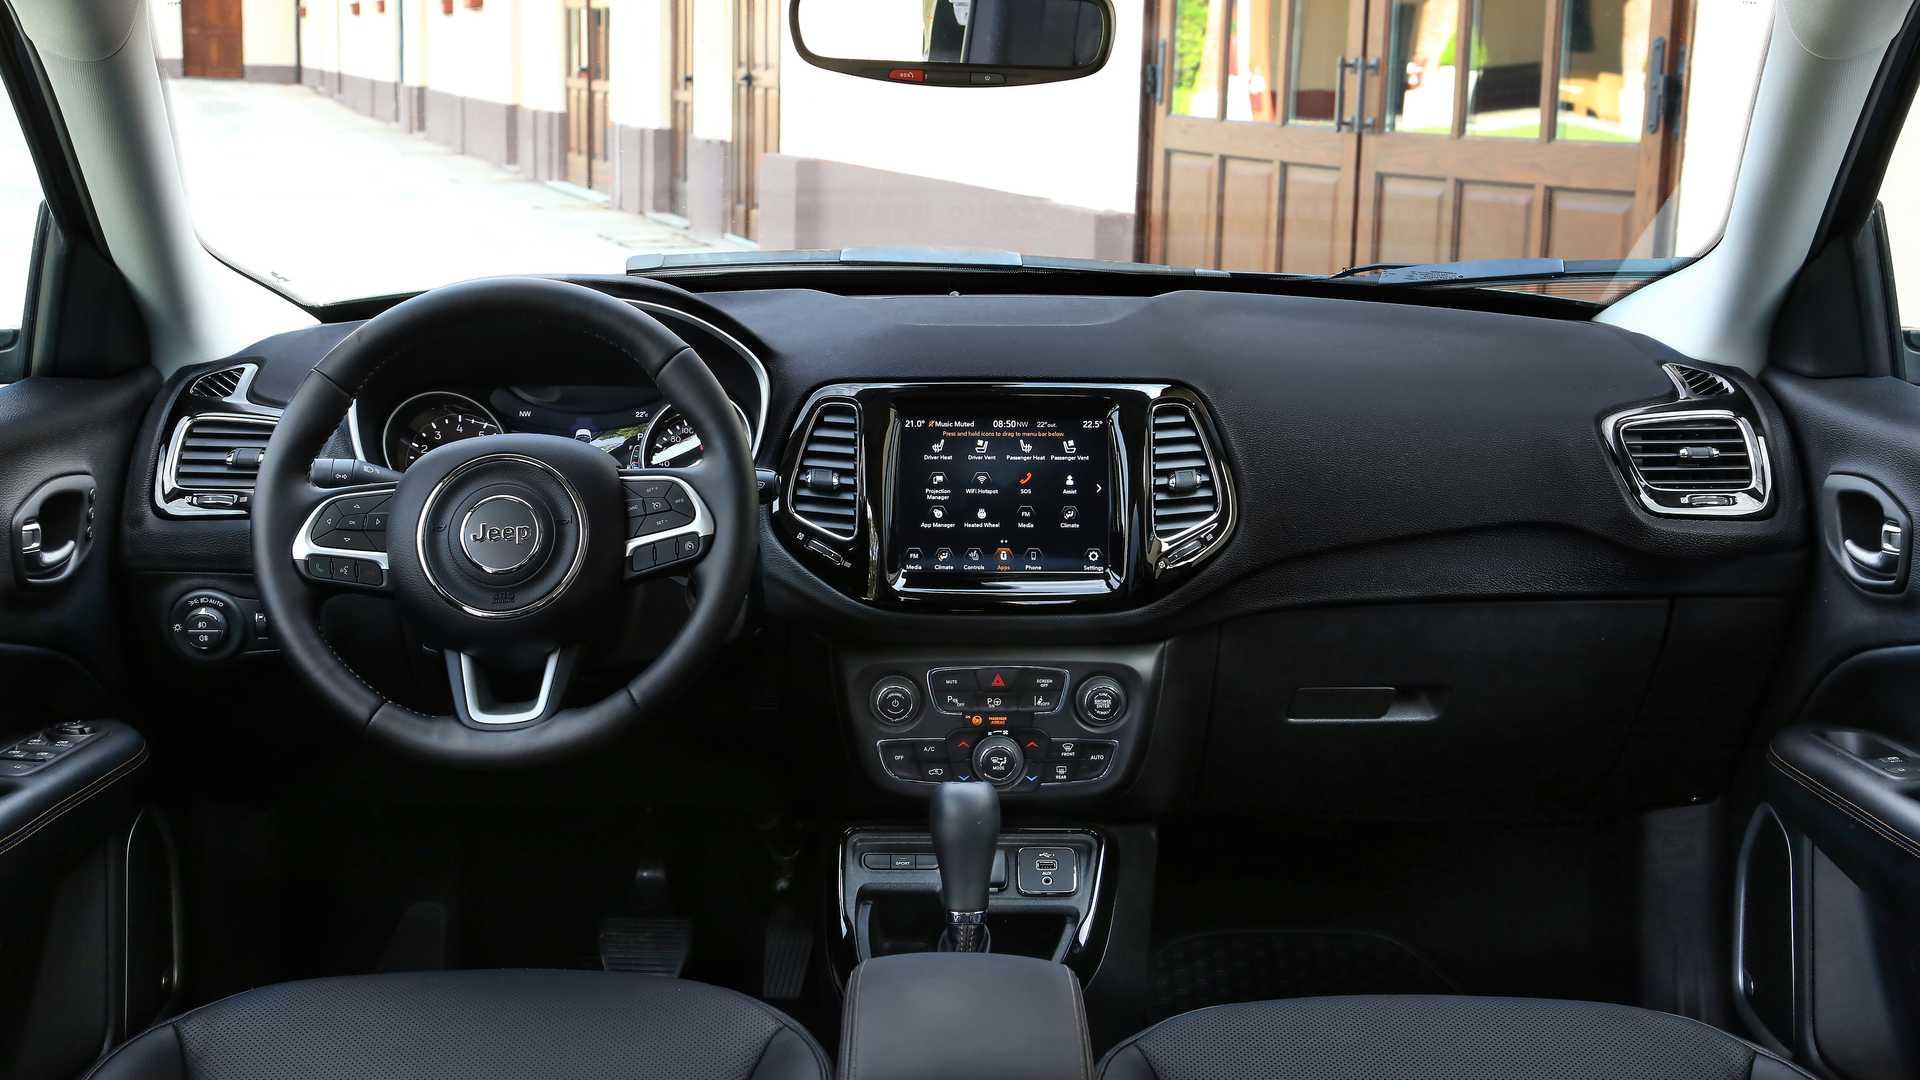 Jeep-Compass-2020-18